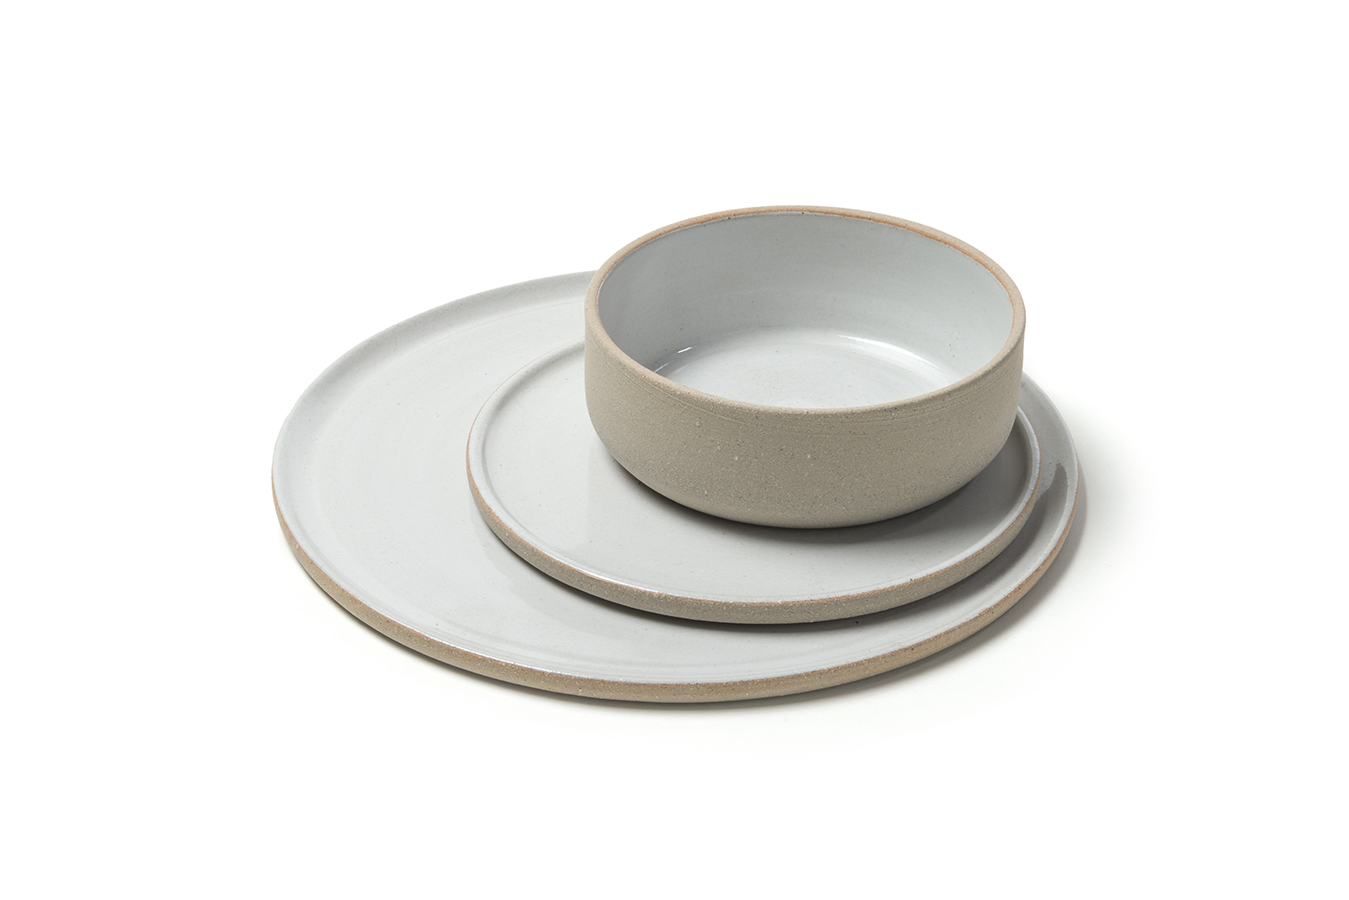 Tufts Luna tableware by Ingrid Tufts